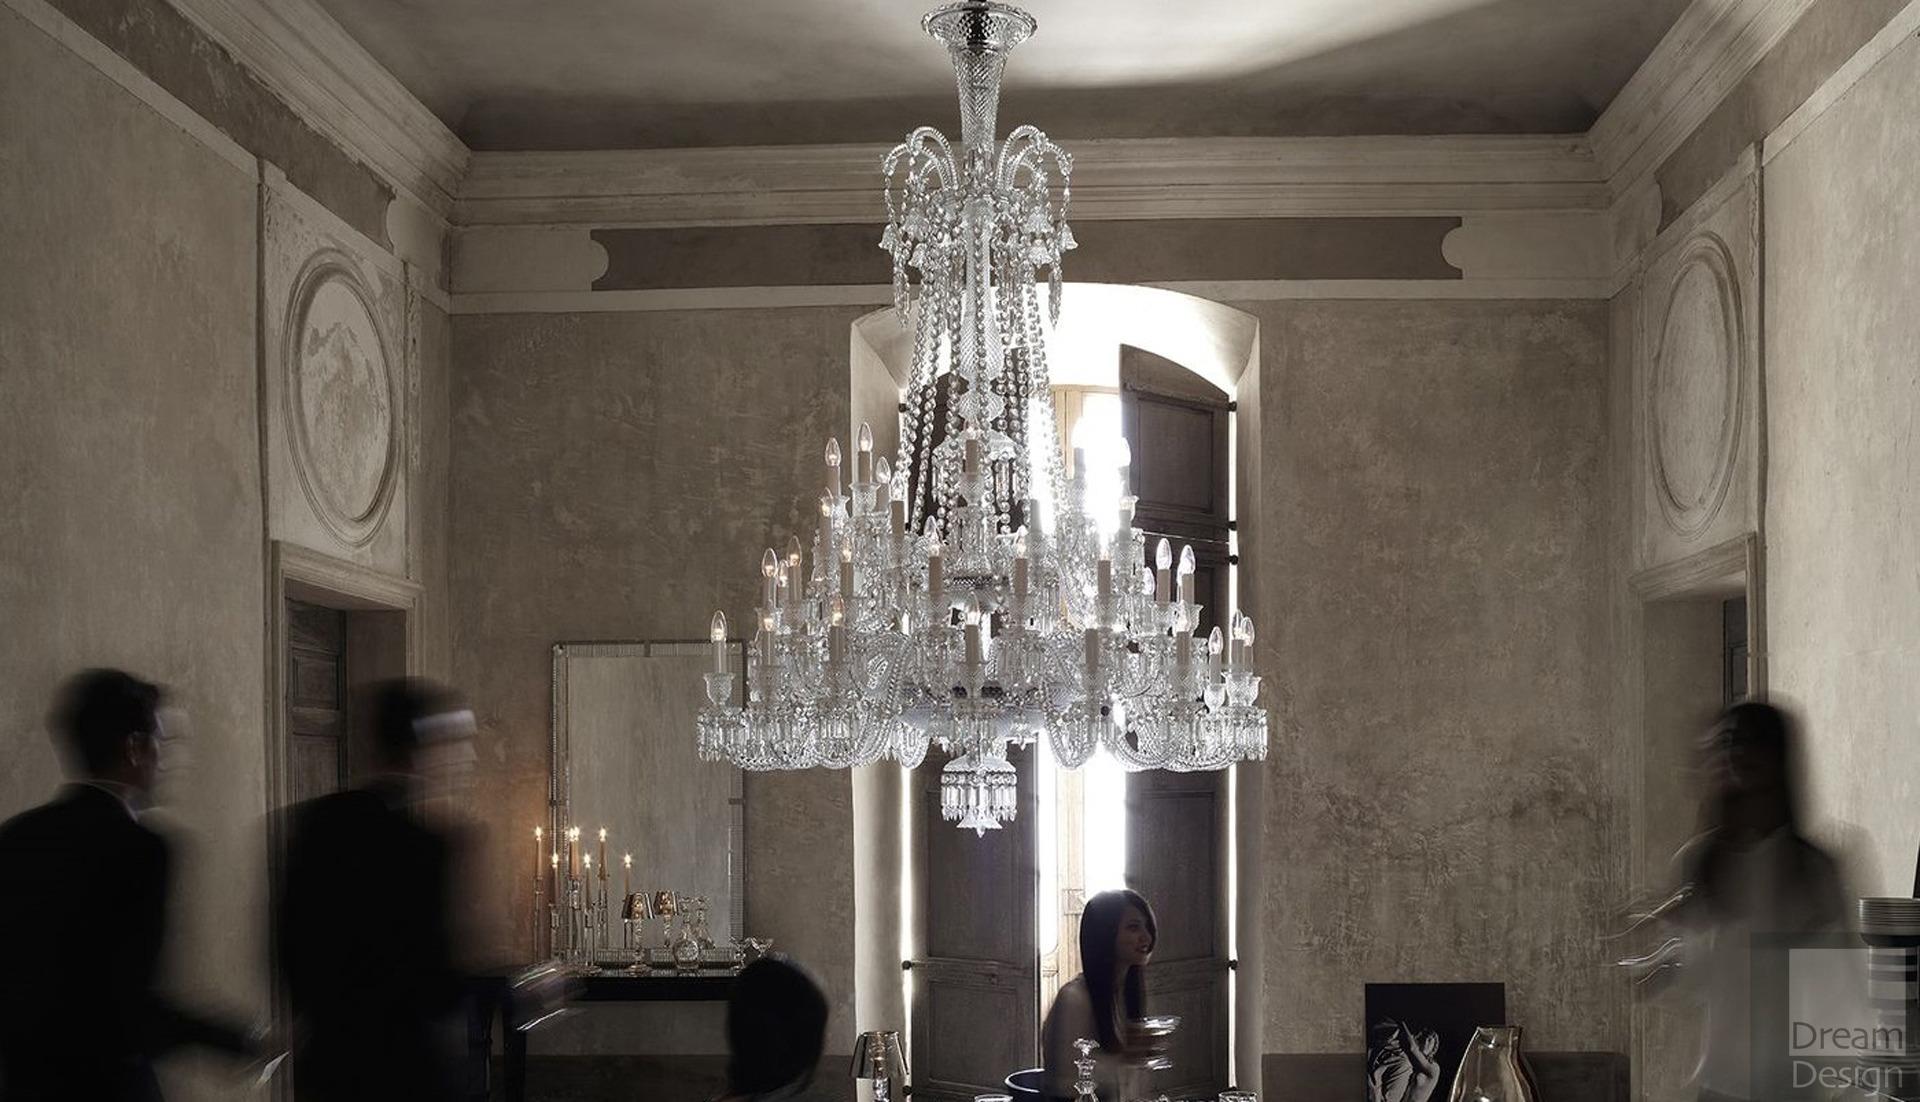 baccarat zenith chandelier 48 lights dream design interiors ltd. Black Bedroom Furniture Sets. Home Design Ideas